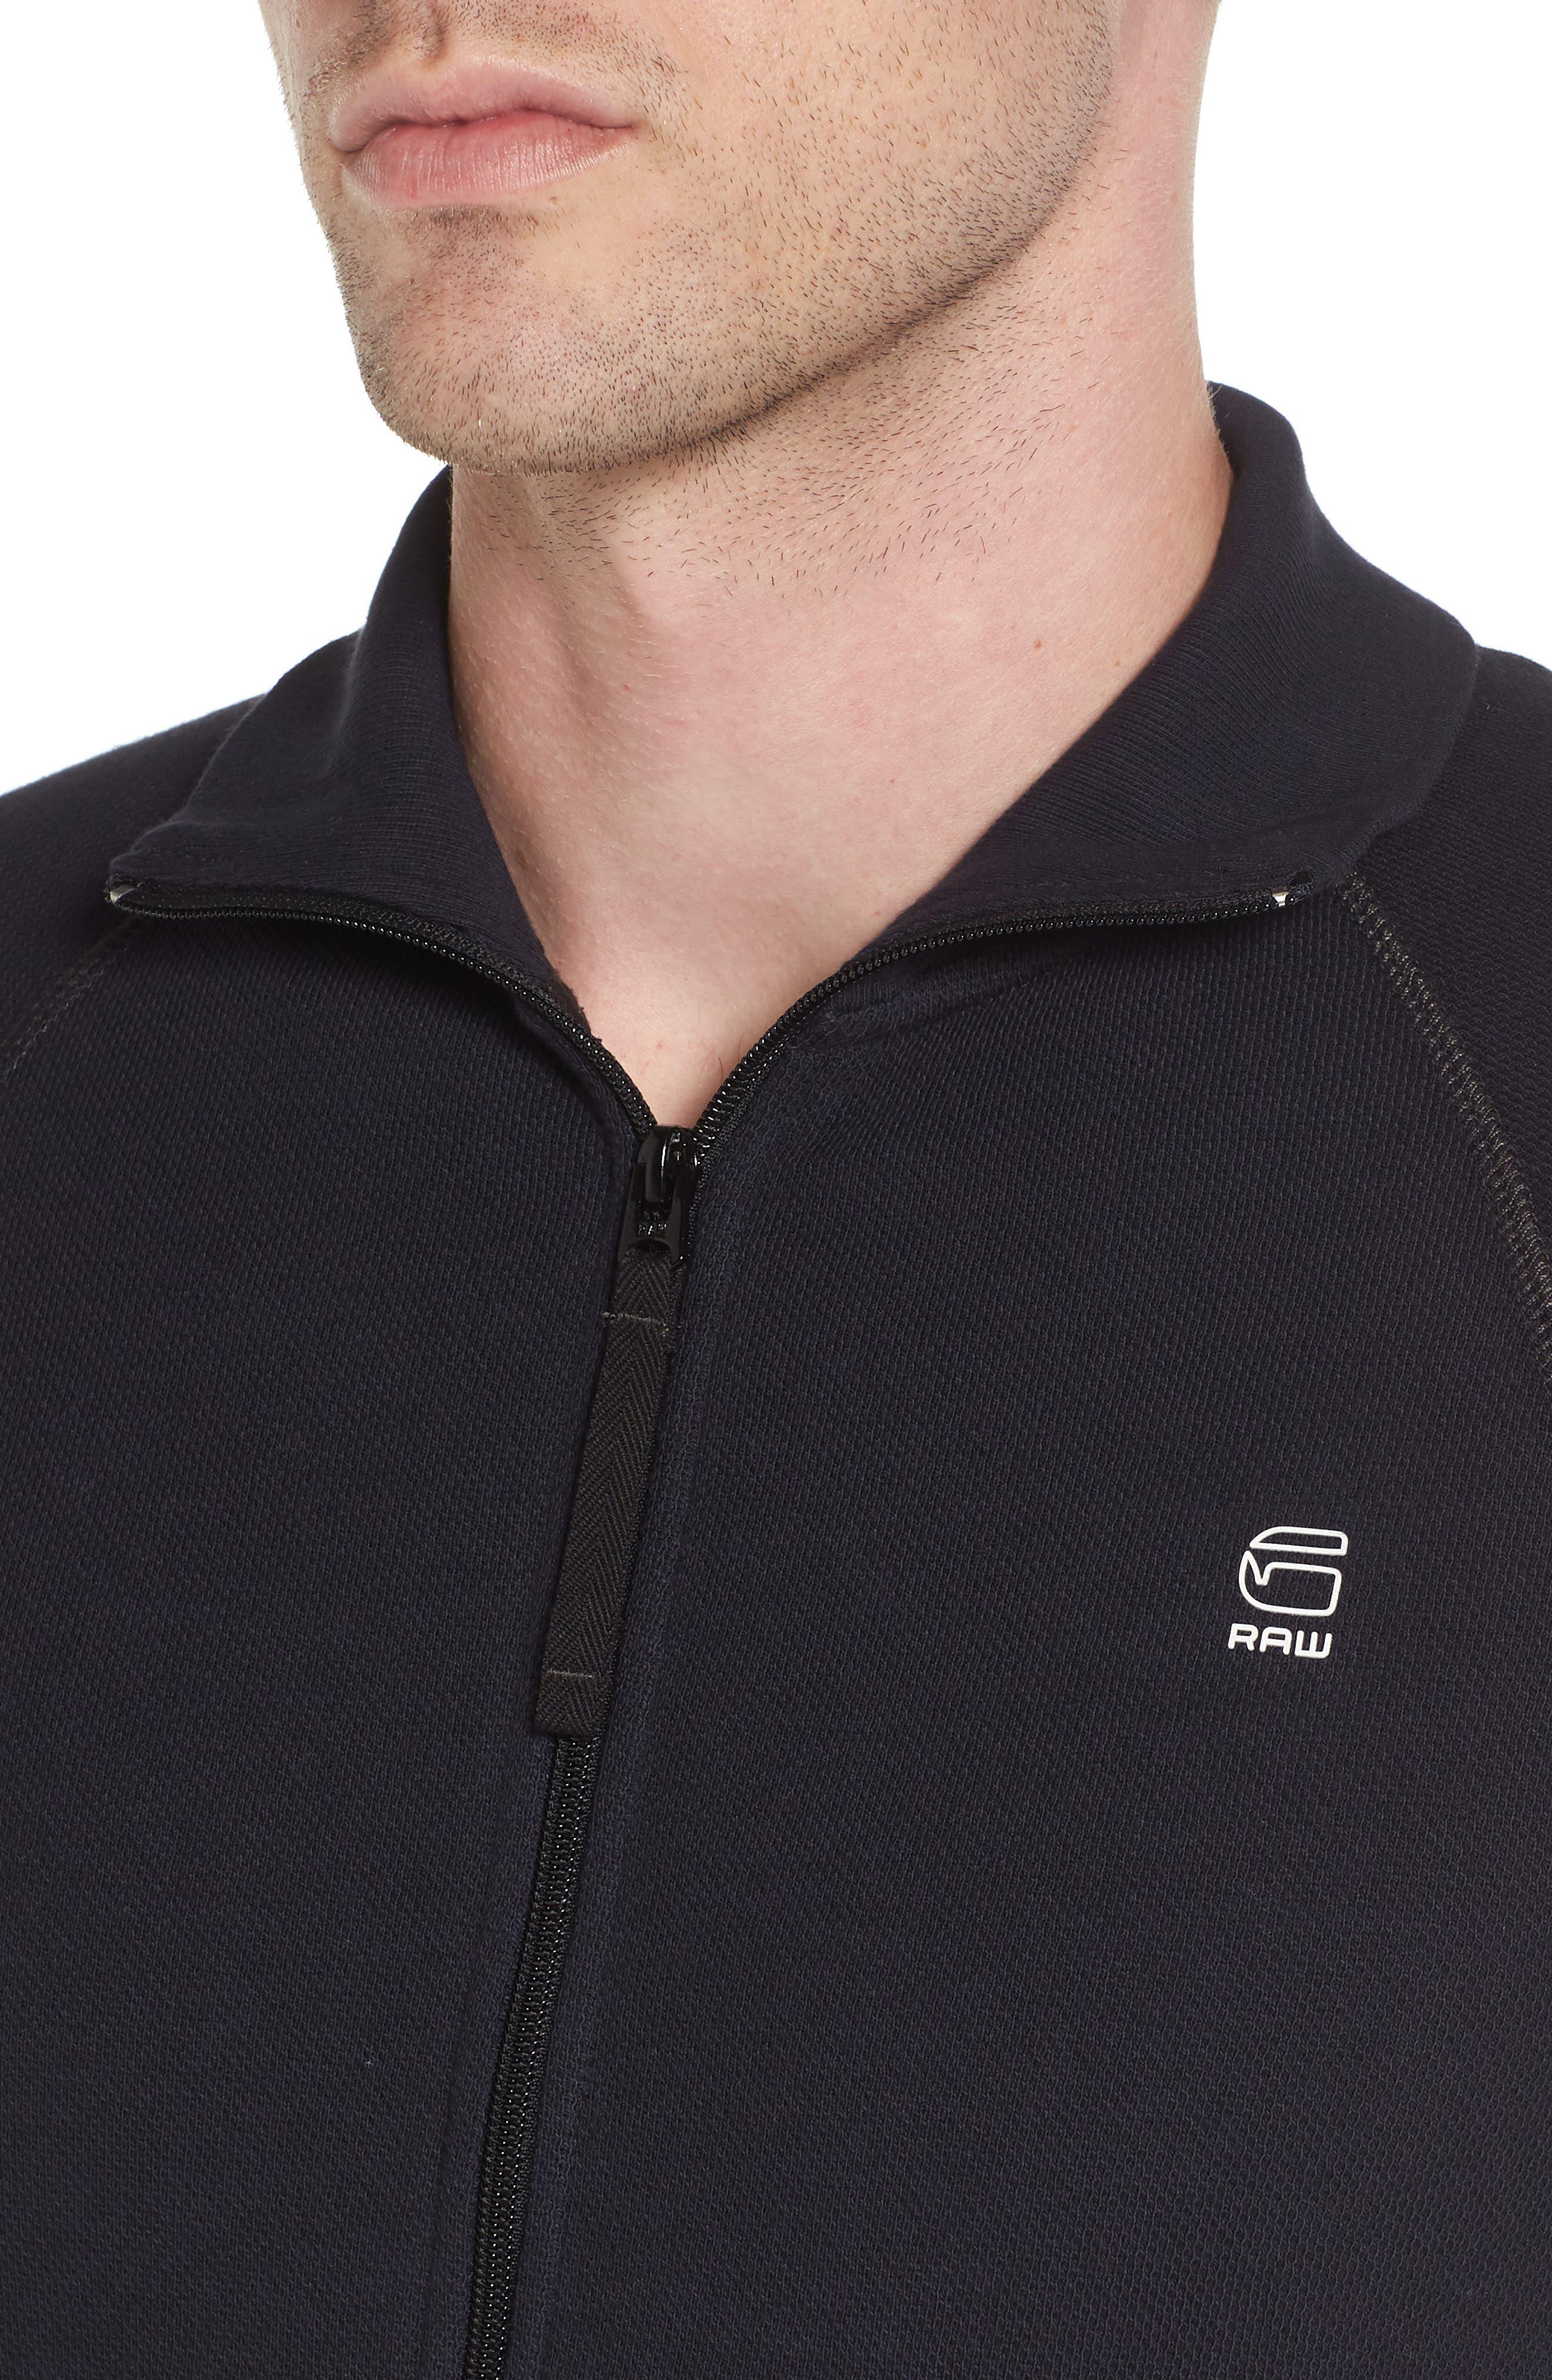 Jirgi Front Zip Sweater,                             Alternate thumbnail 4, color,                             Dark Naval Blue